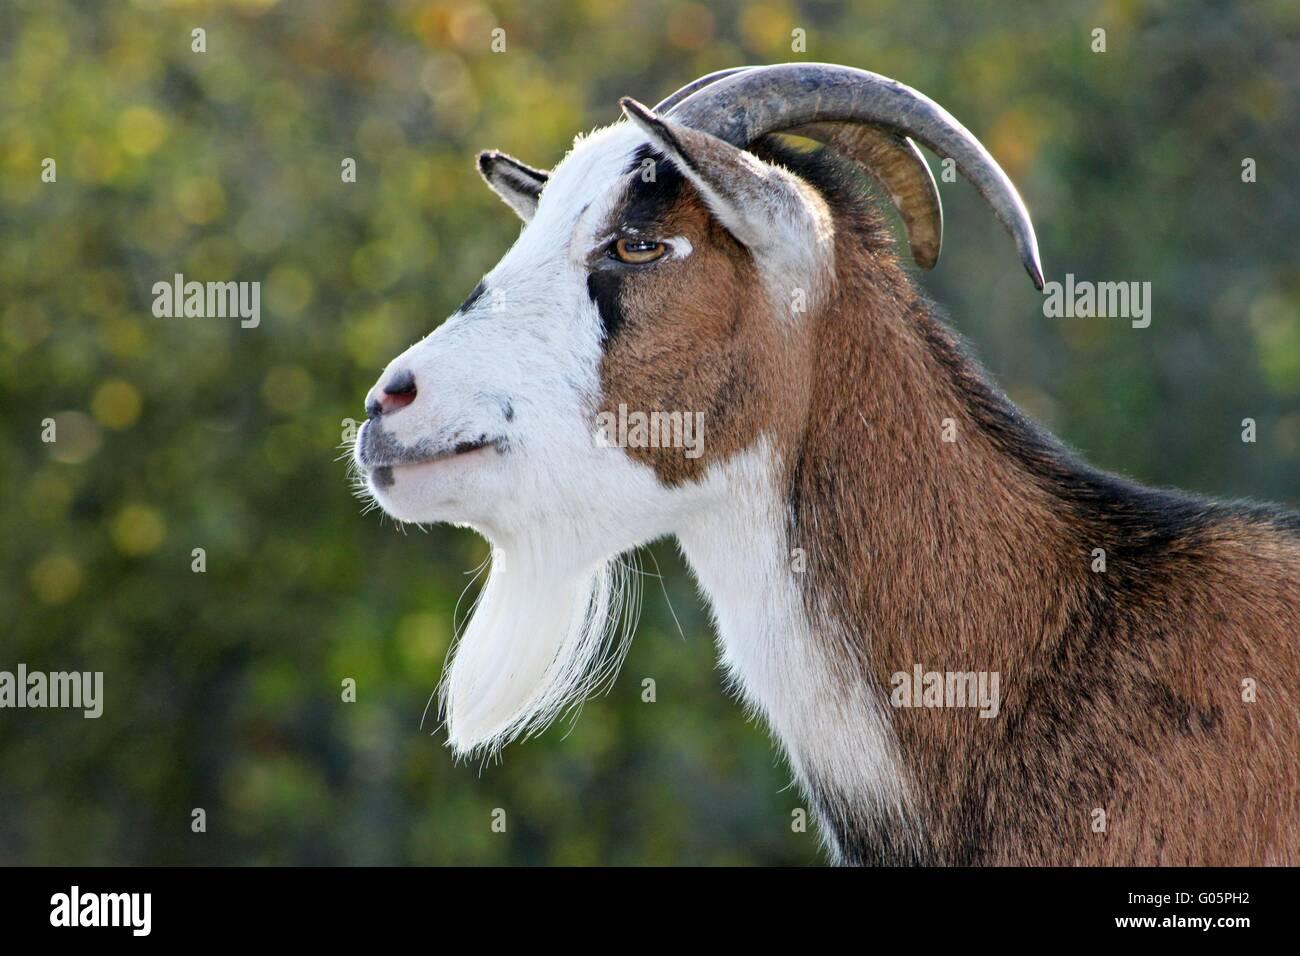 dwarf goat - Stock Image